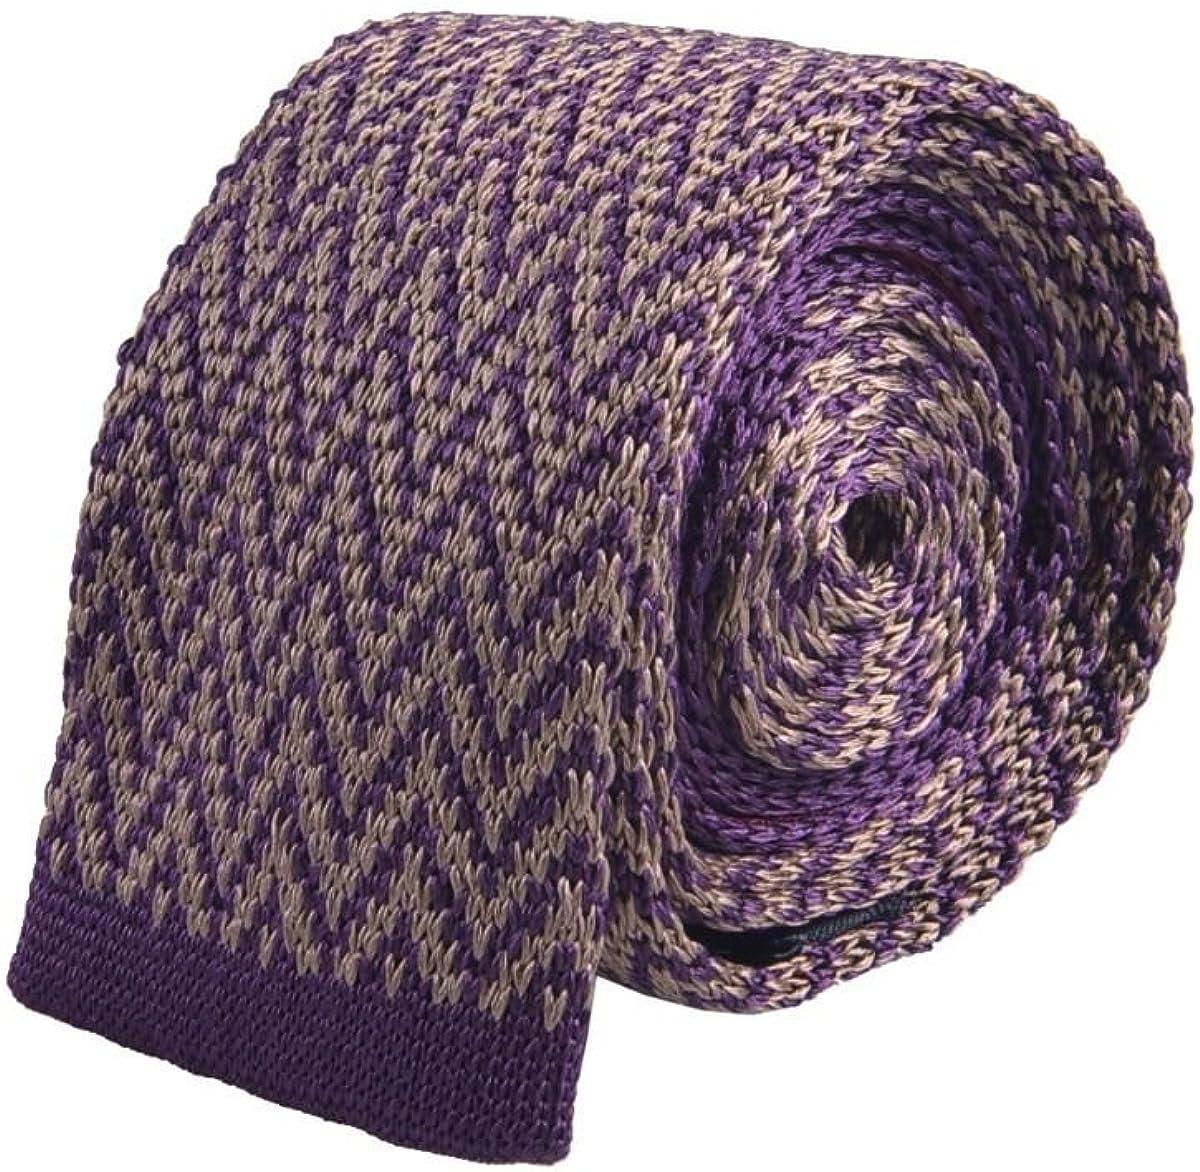 Pringle Of Scotland Men's 100% Silk Multi-Color Neckwear Tie Cravat